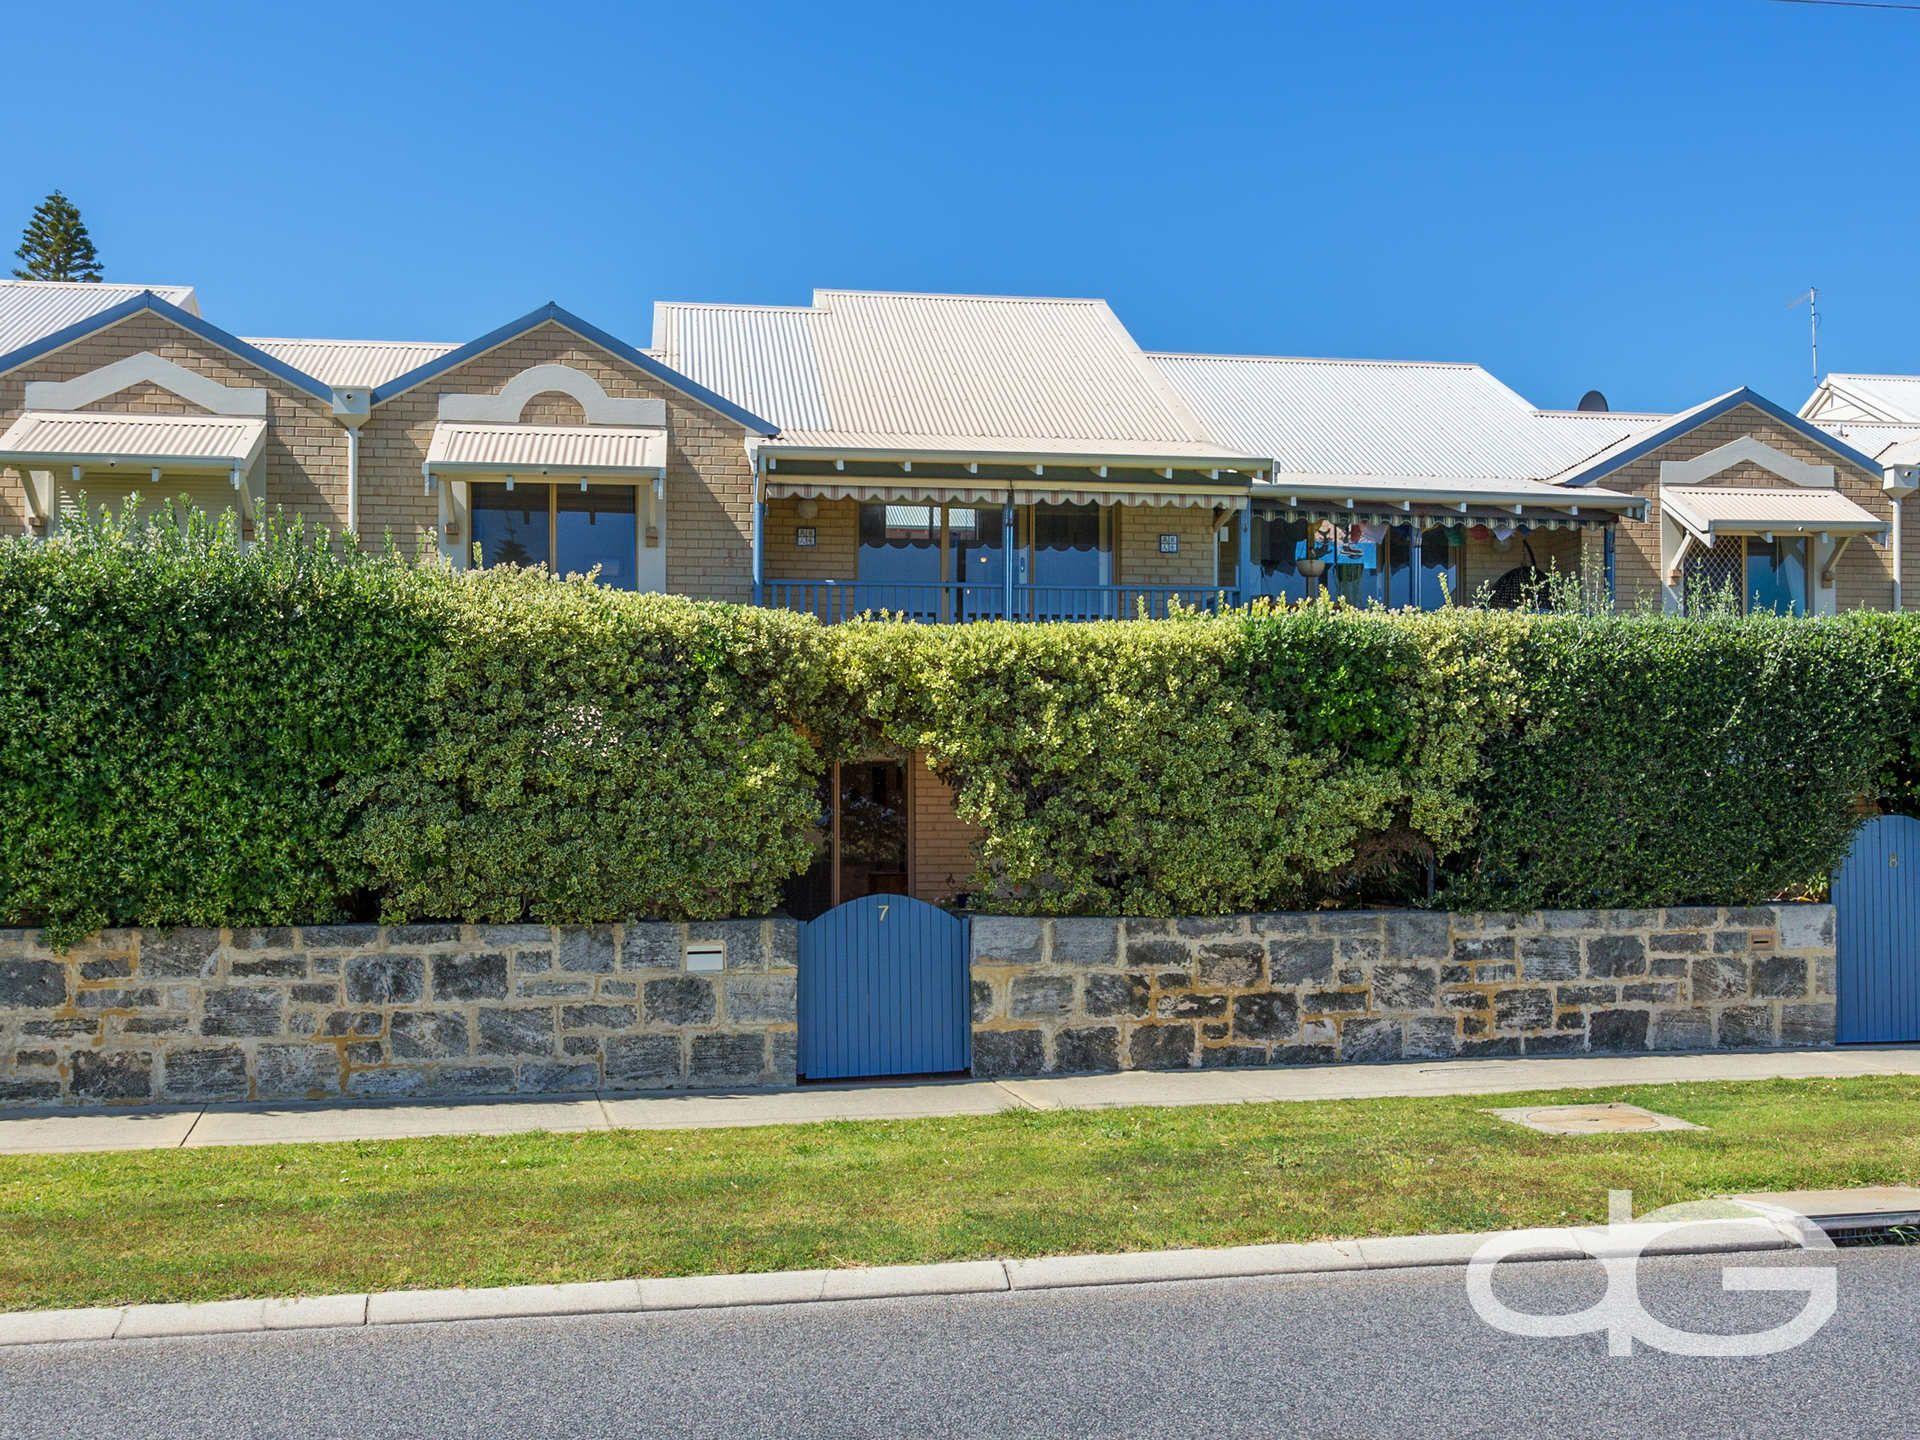 7/174 Marine Terrace, South Fremantle